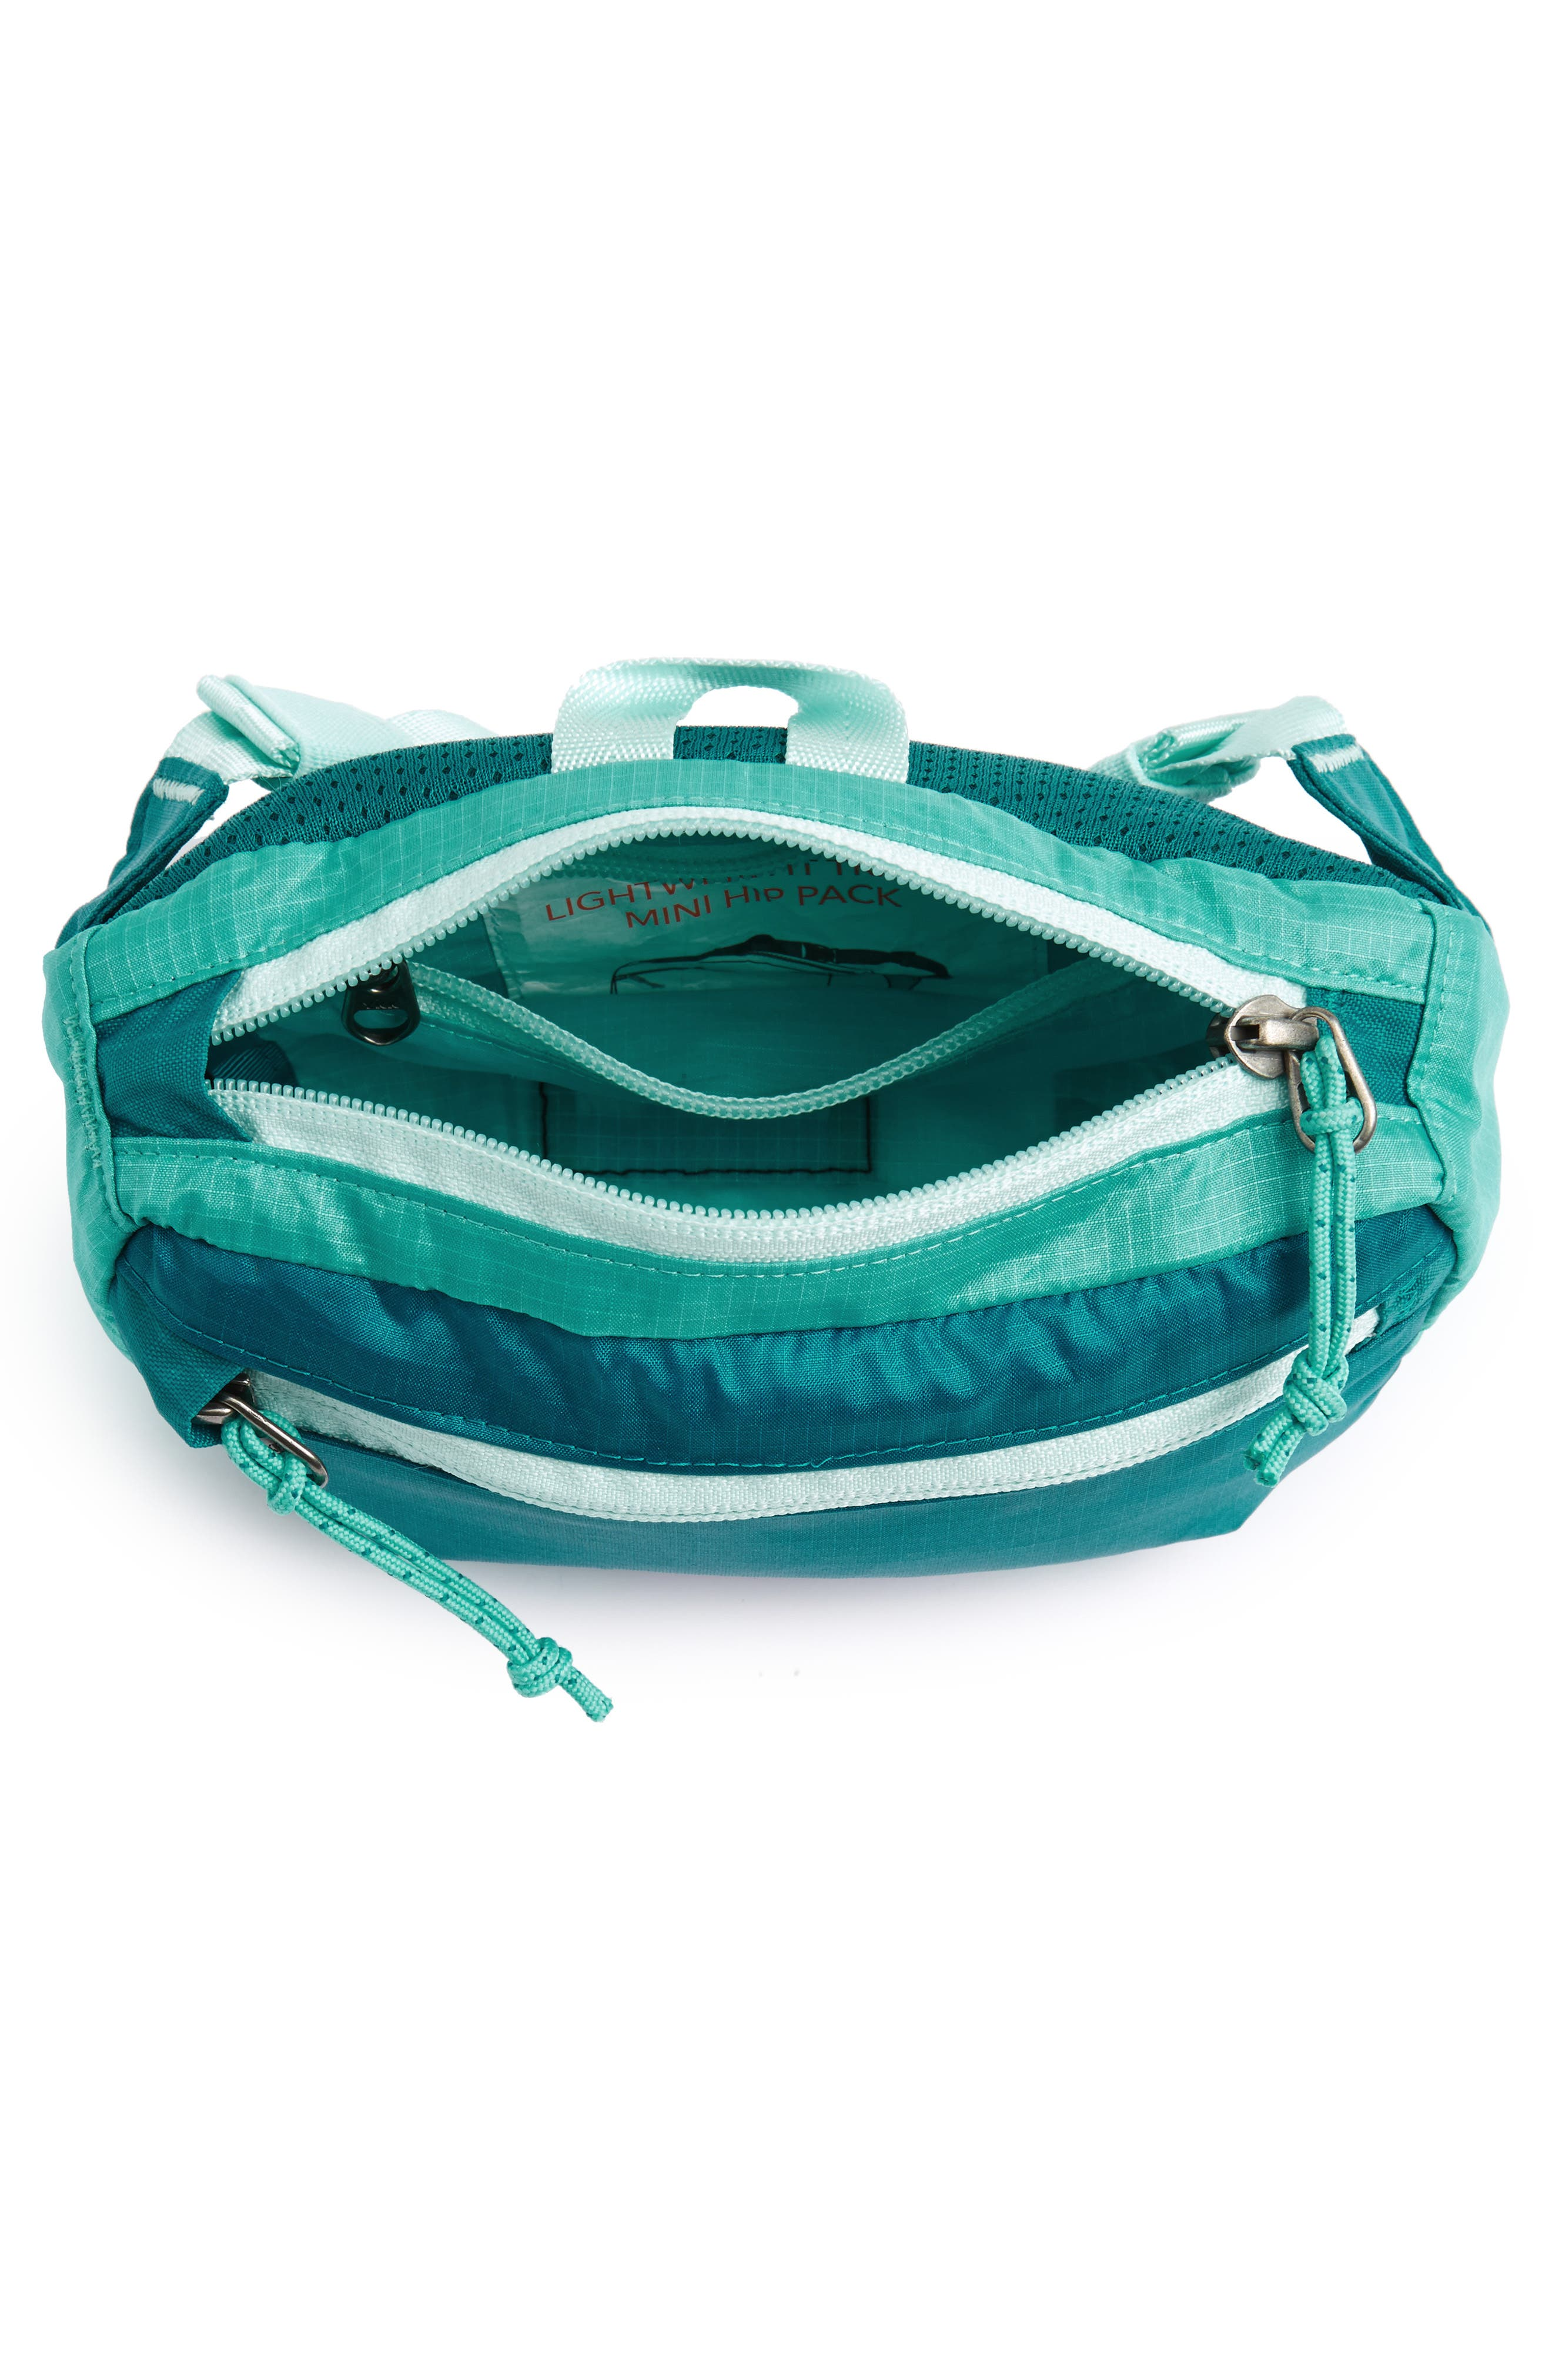 Travel Belt Bag,                             Alternate thumbnail 13, color,